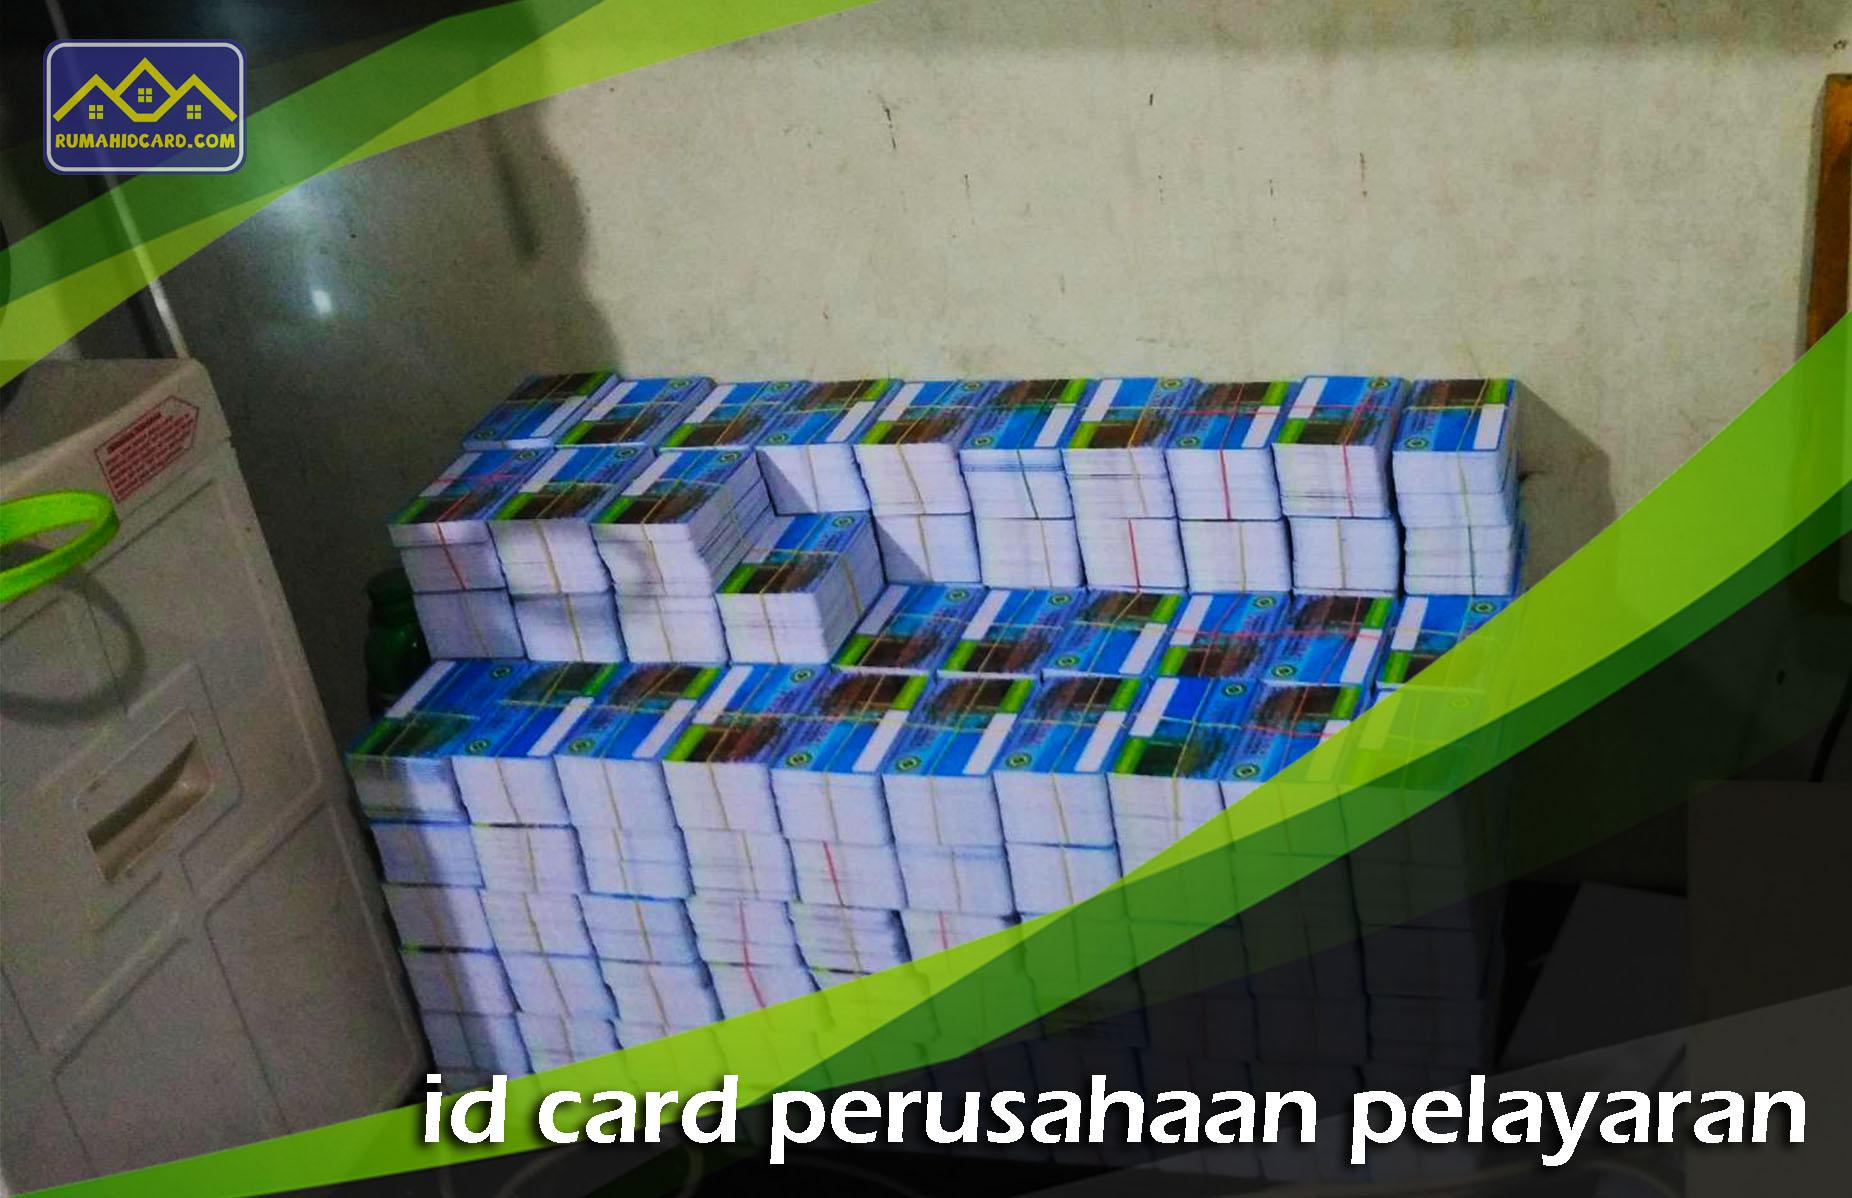 ID Card Perusahaan Pelayaran